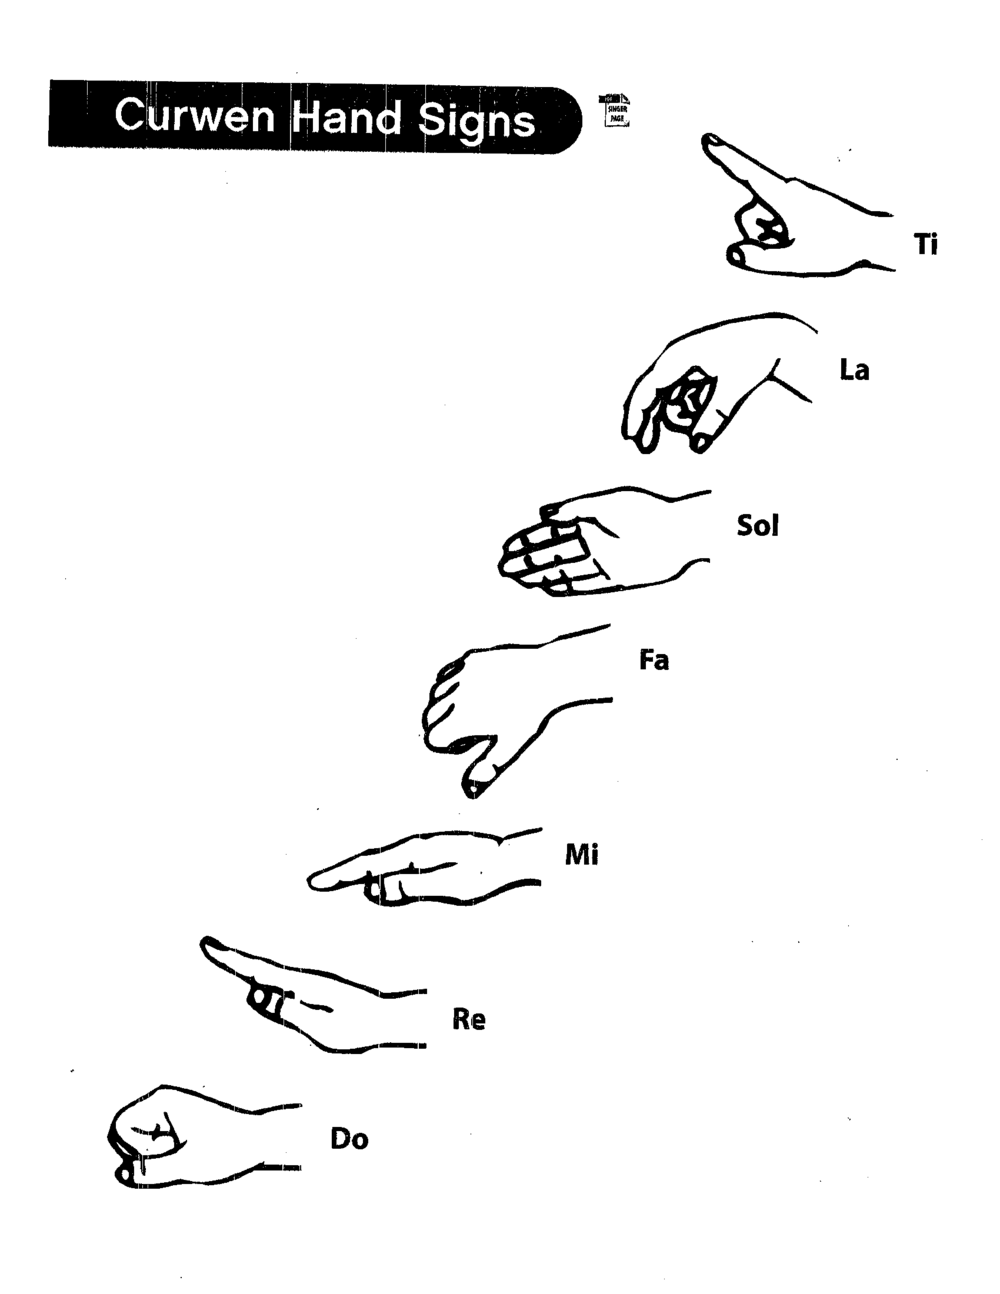 Curwen Hand Signs.png